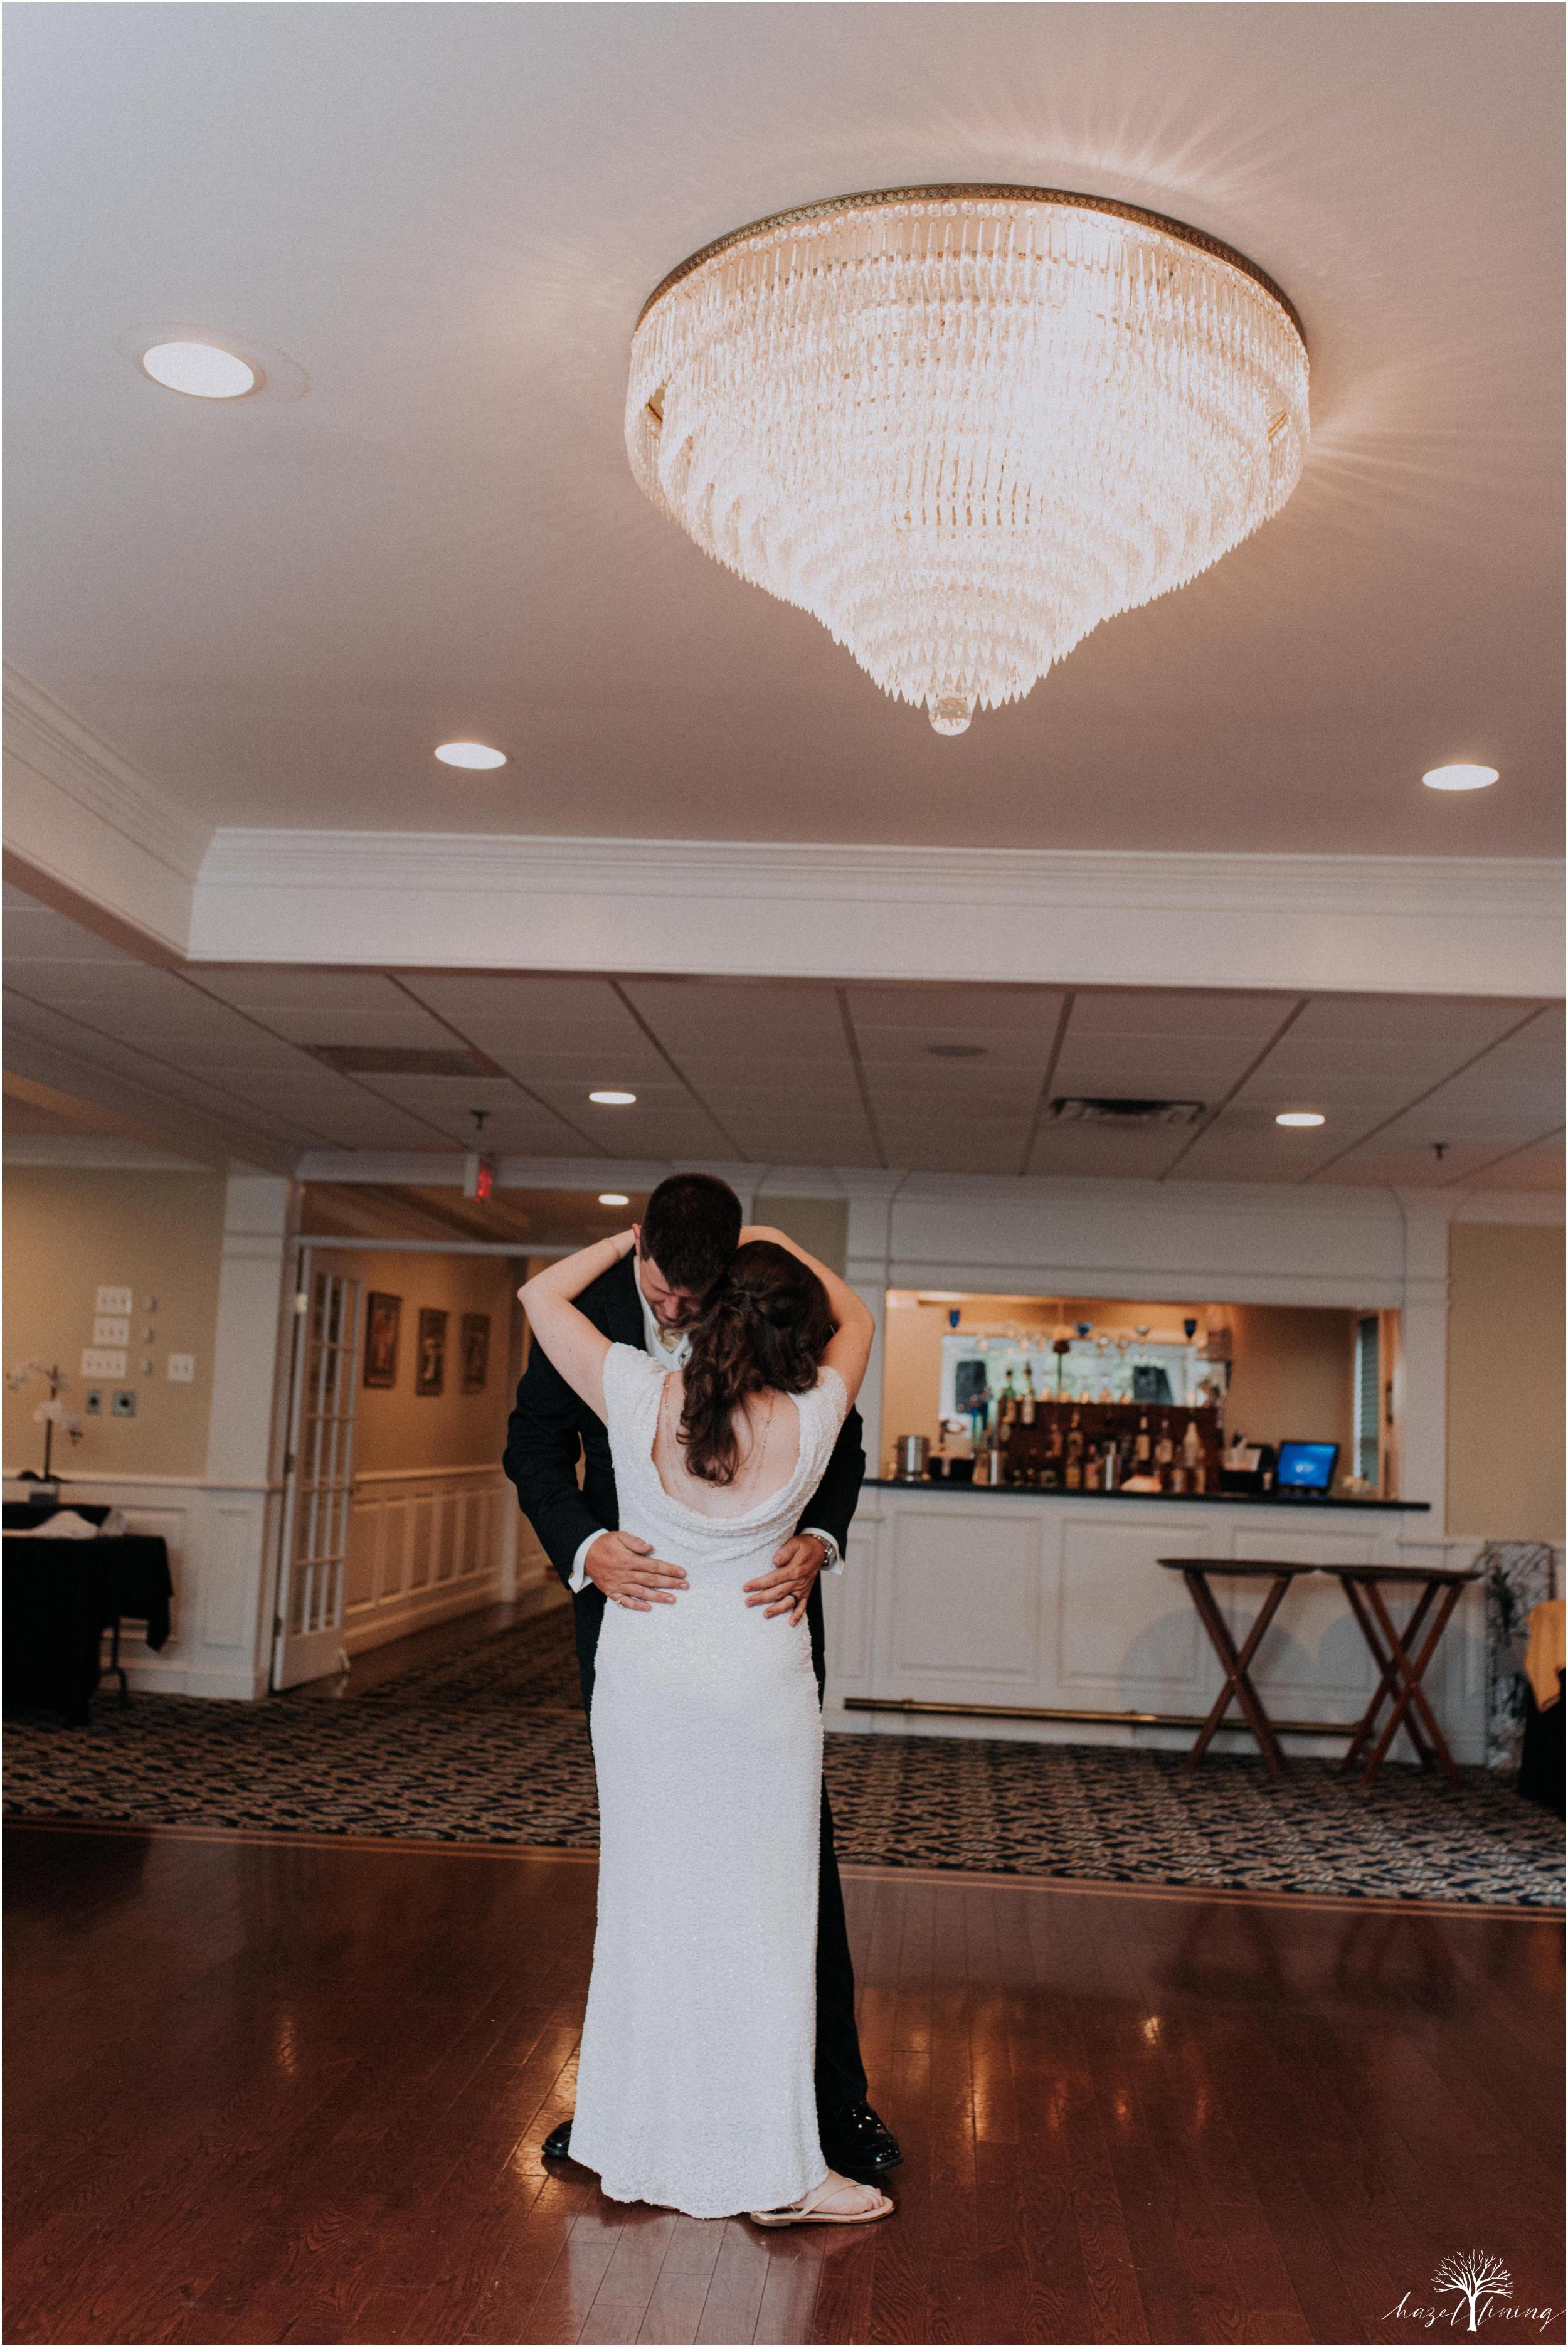 elizabeth-doelp-andrew-foreback-middletown-country-club-summer-langhorne-pennsylvania-wedding-hazel-lining-travel-wedding-elopement-photography_0133.jpg